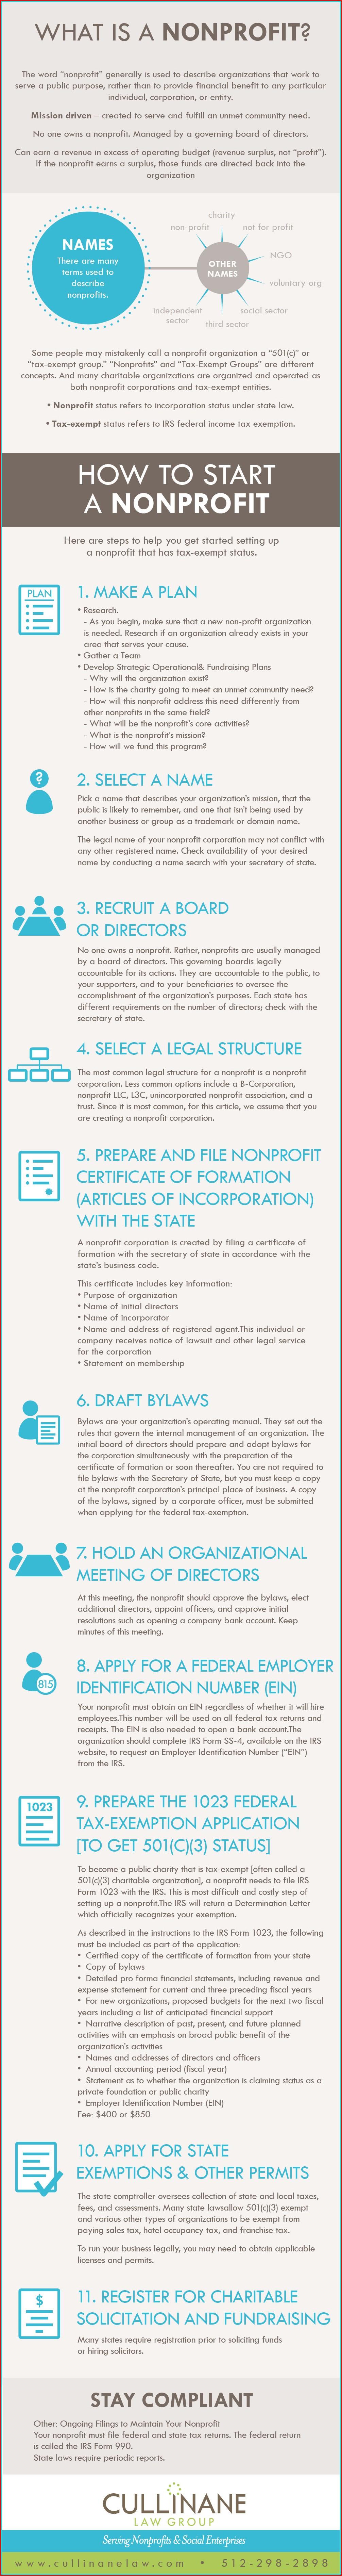 501 C 3 Formation Checklist